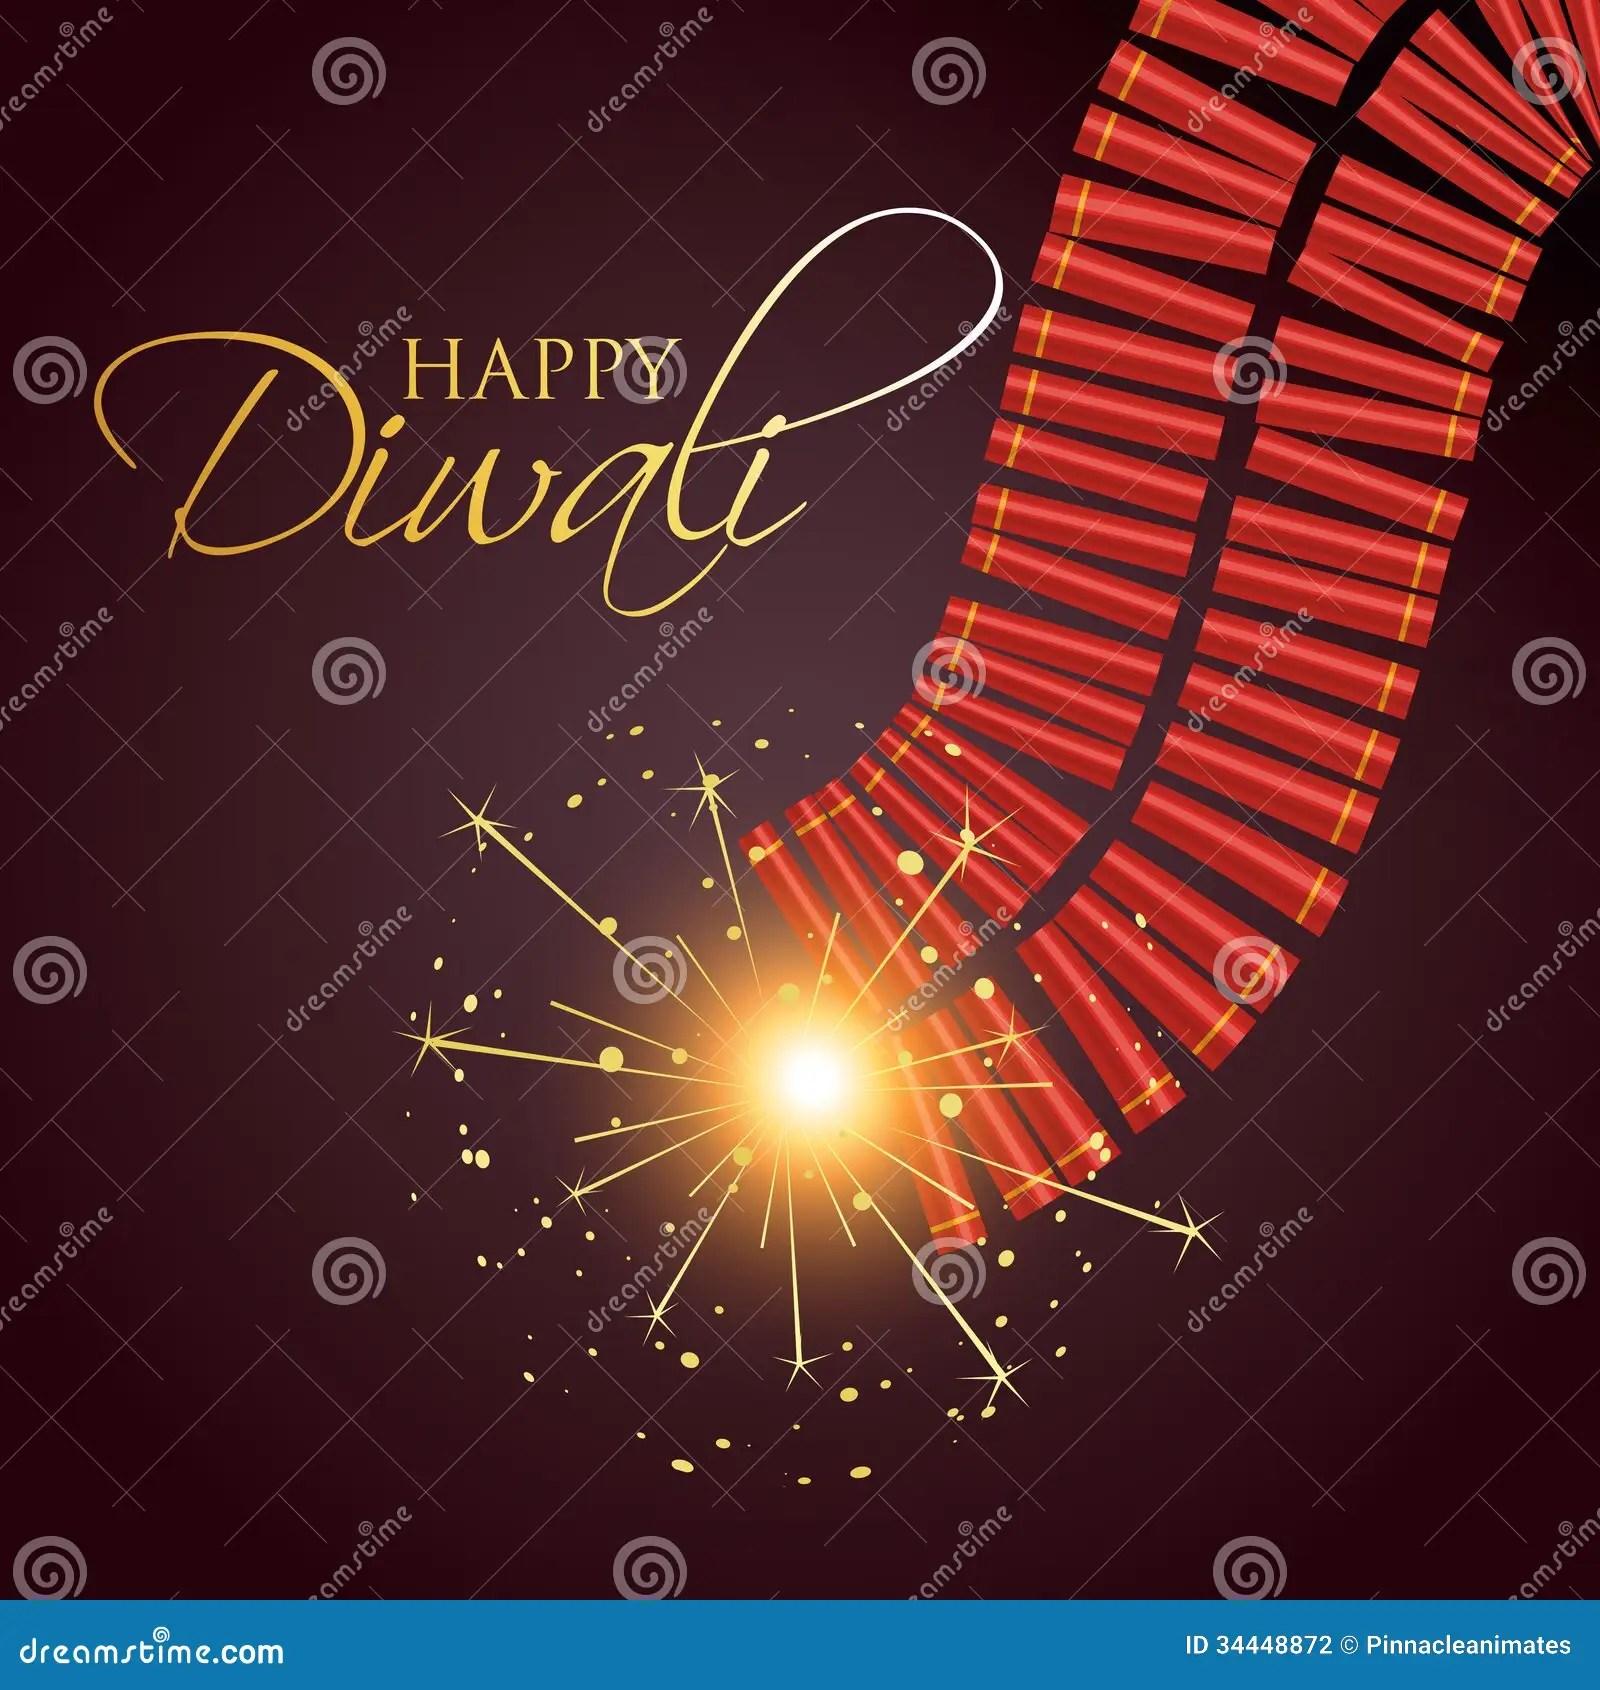 Diwali Hd Wallpaper Download Diwali Burning Crackers Stock Vector Illustration Of